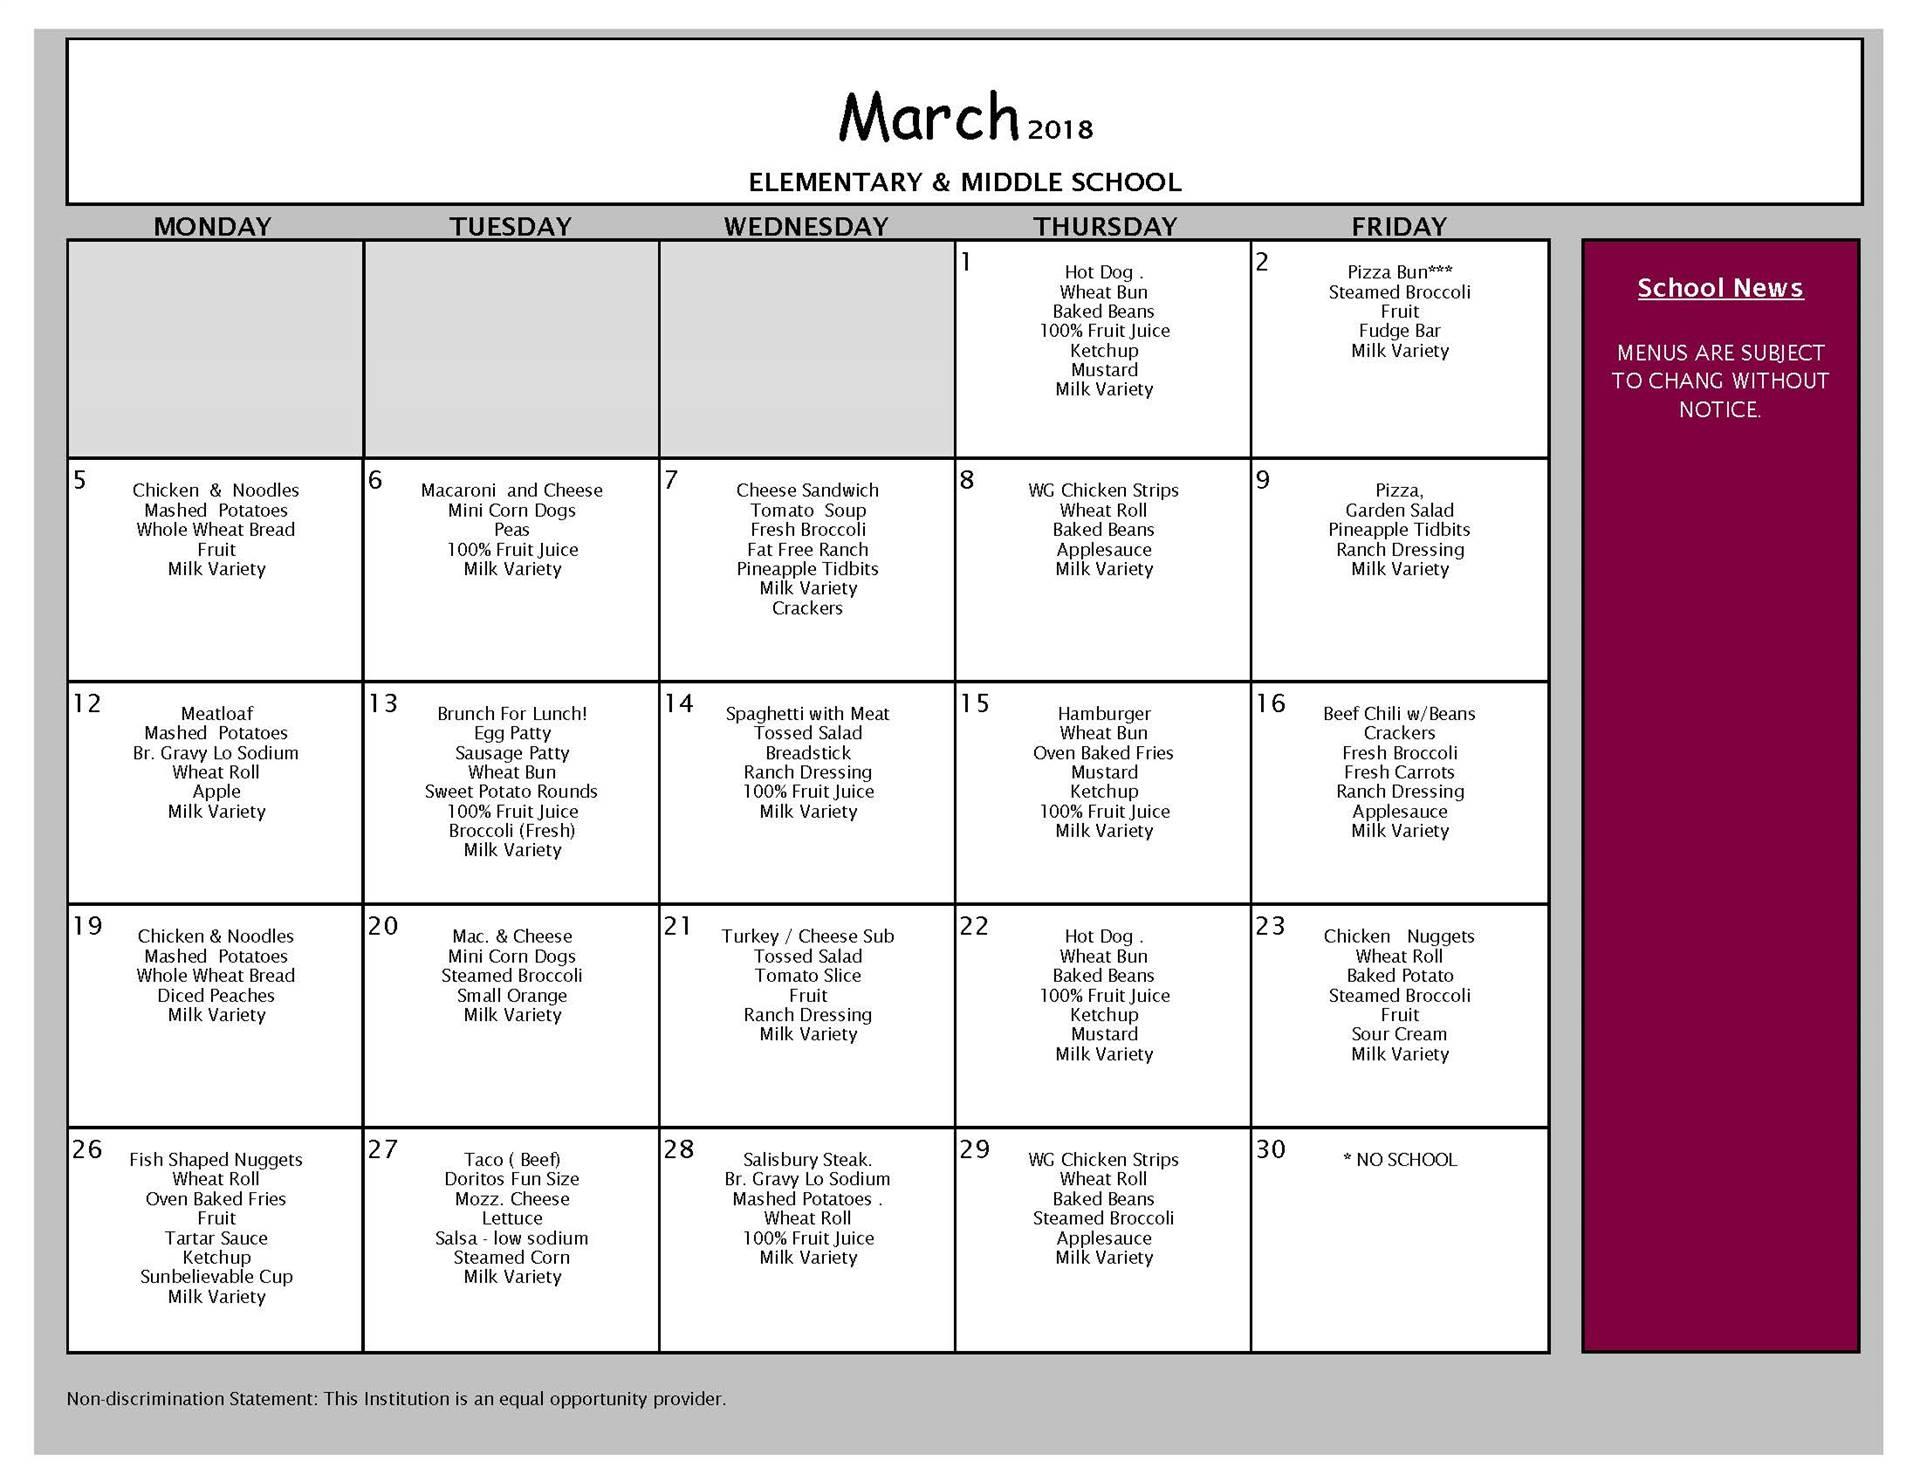 March Breakfast Menu - All Buildings